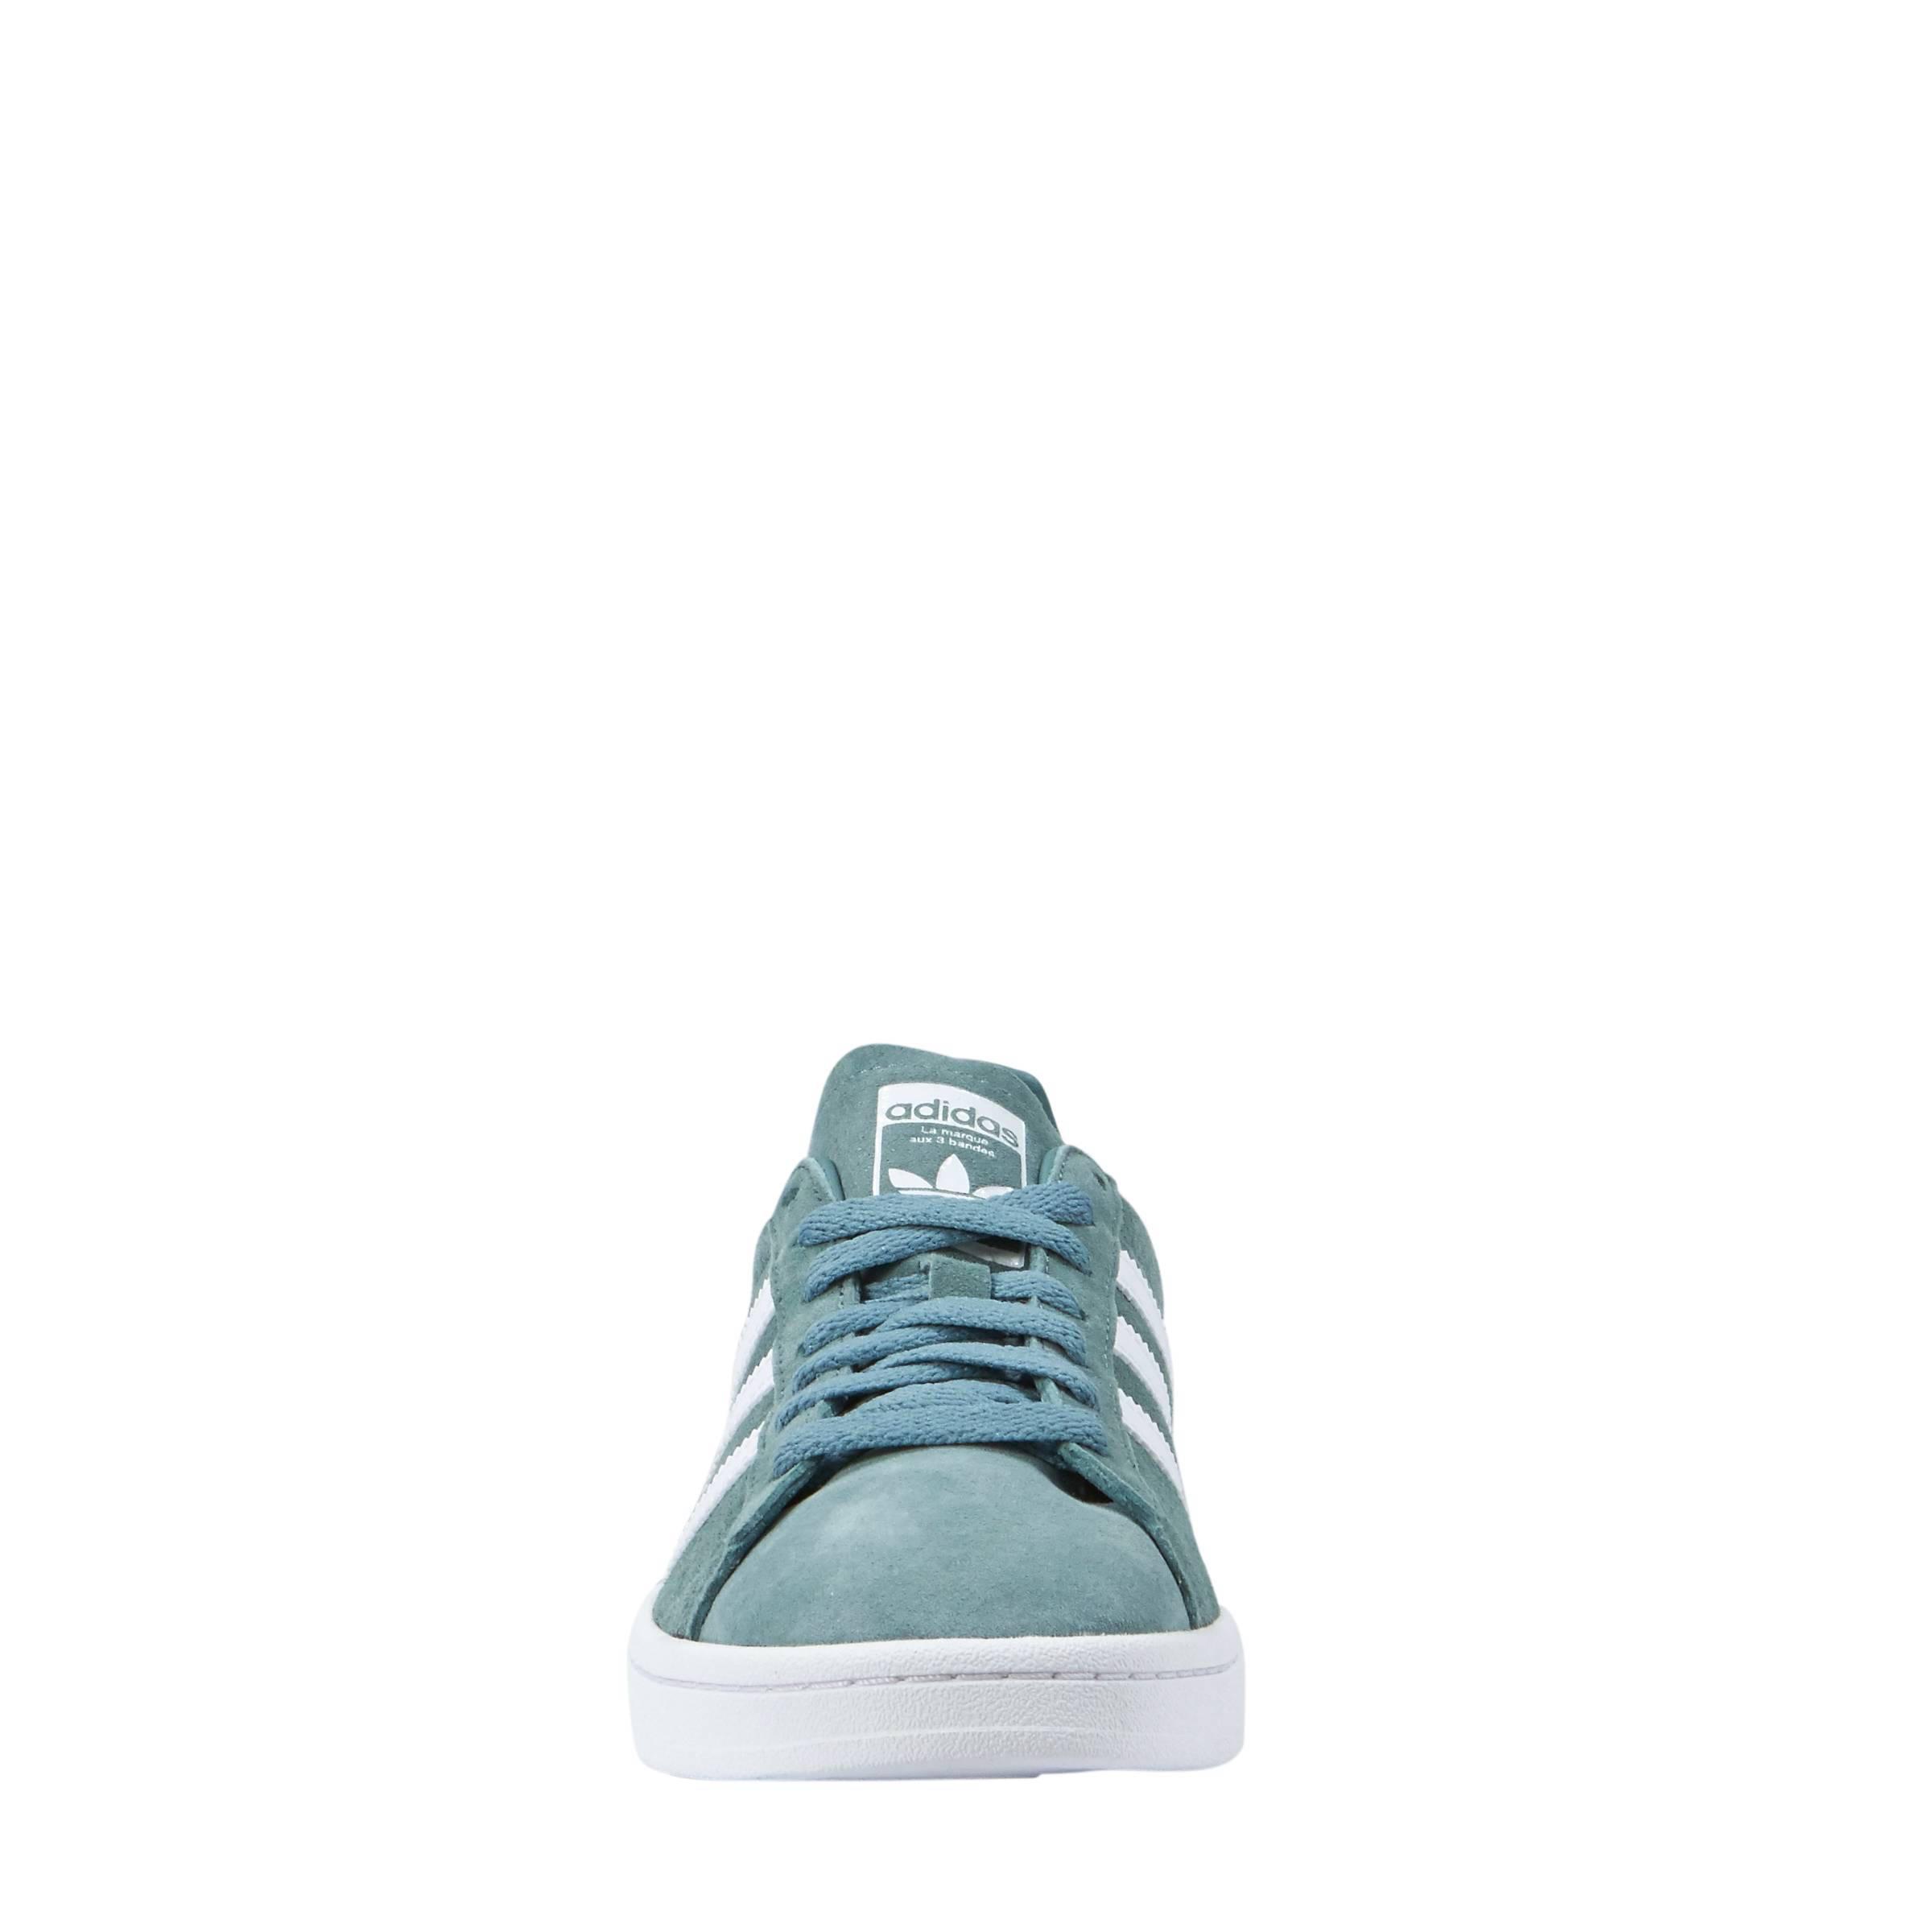 adidas Originals Campus suède sneakers groen | wehkamp